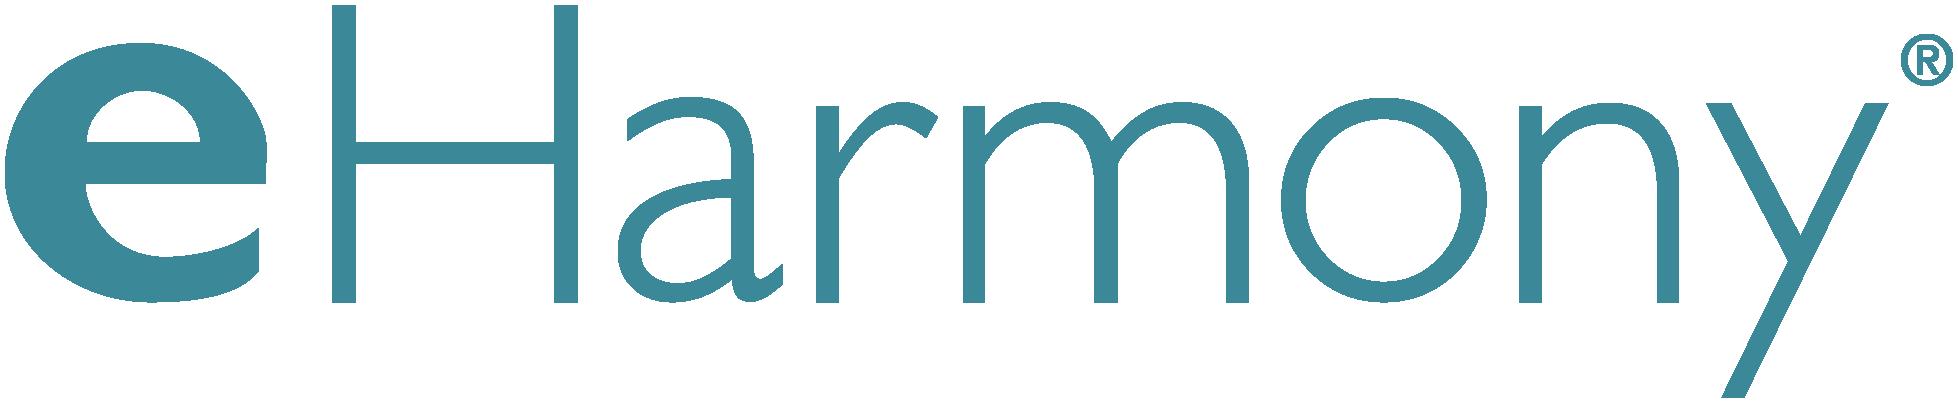 EHarmony - Logo 2